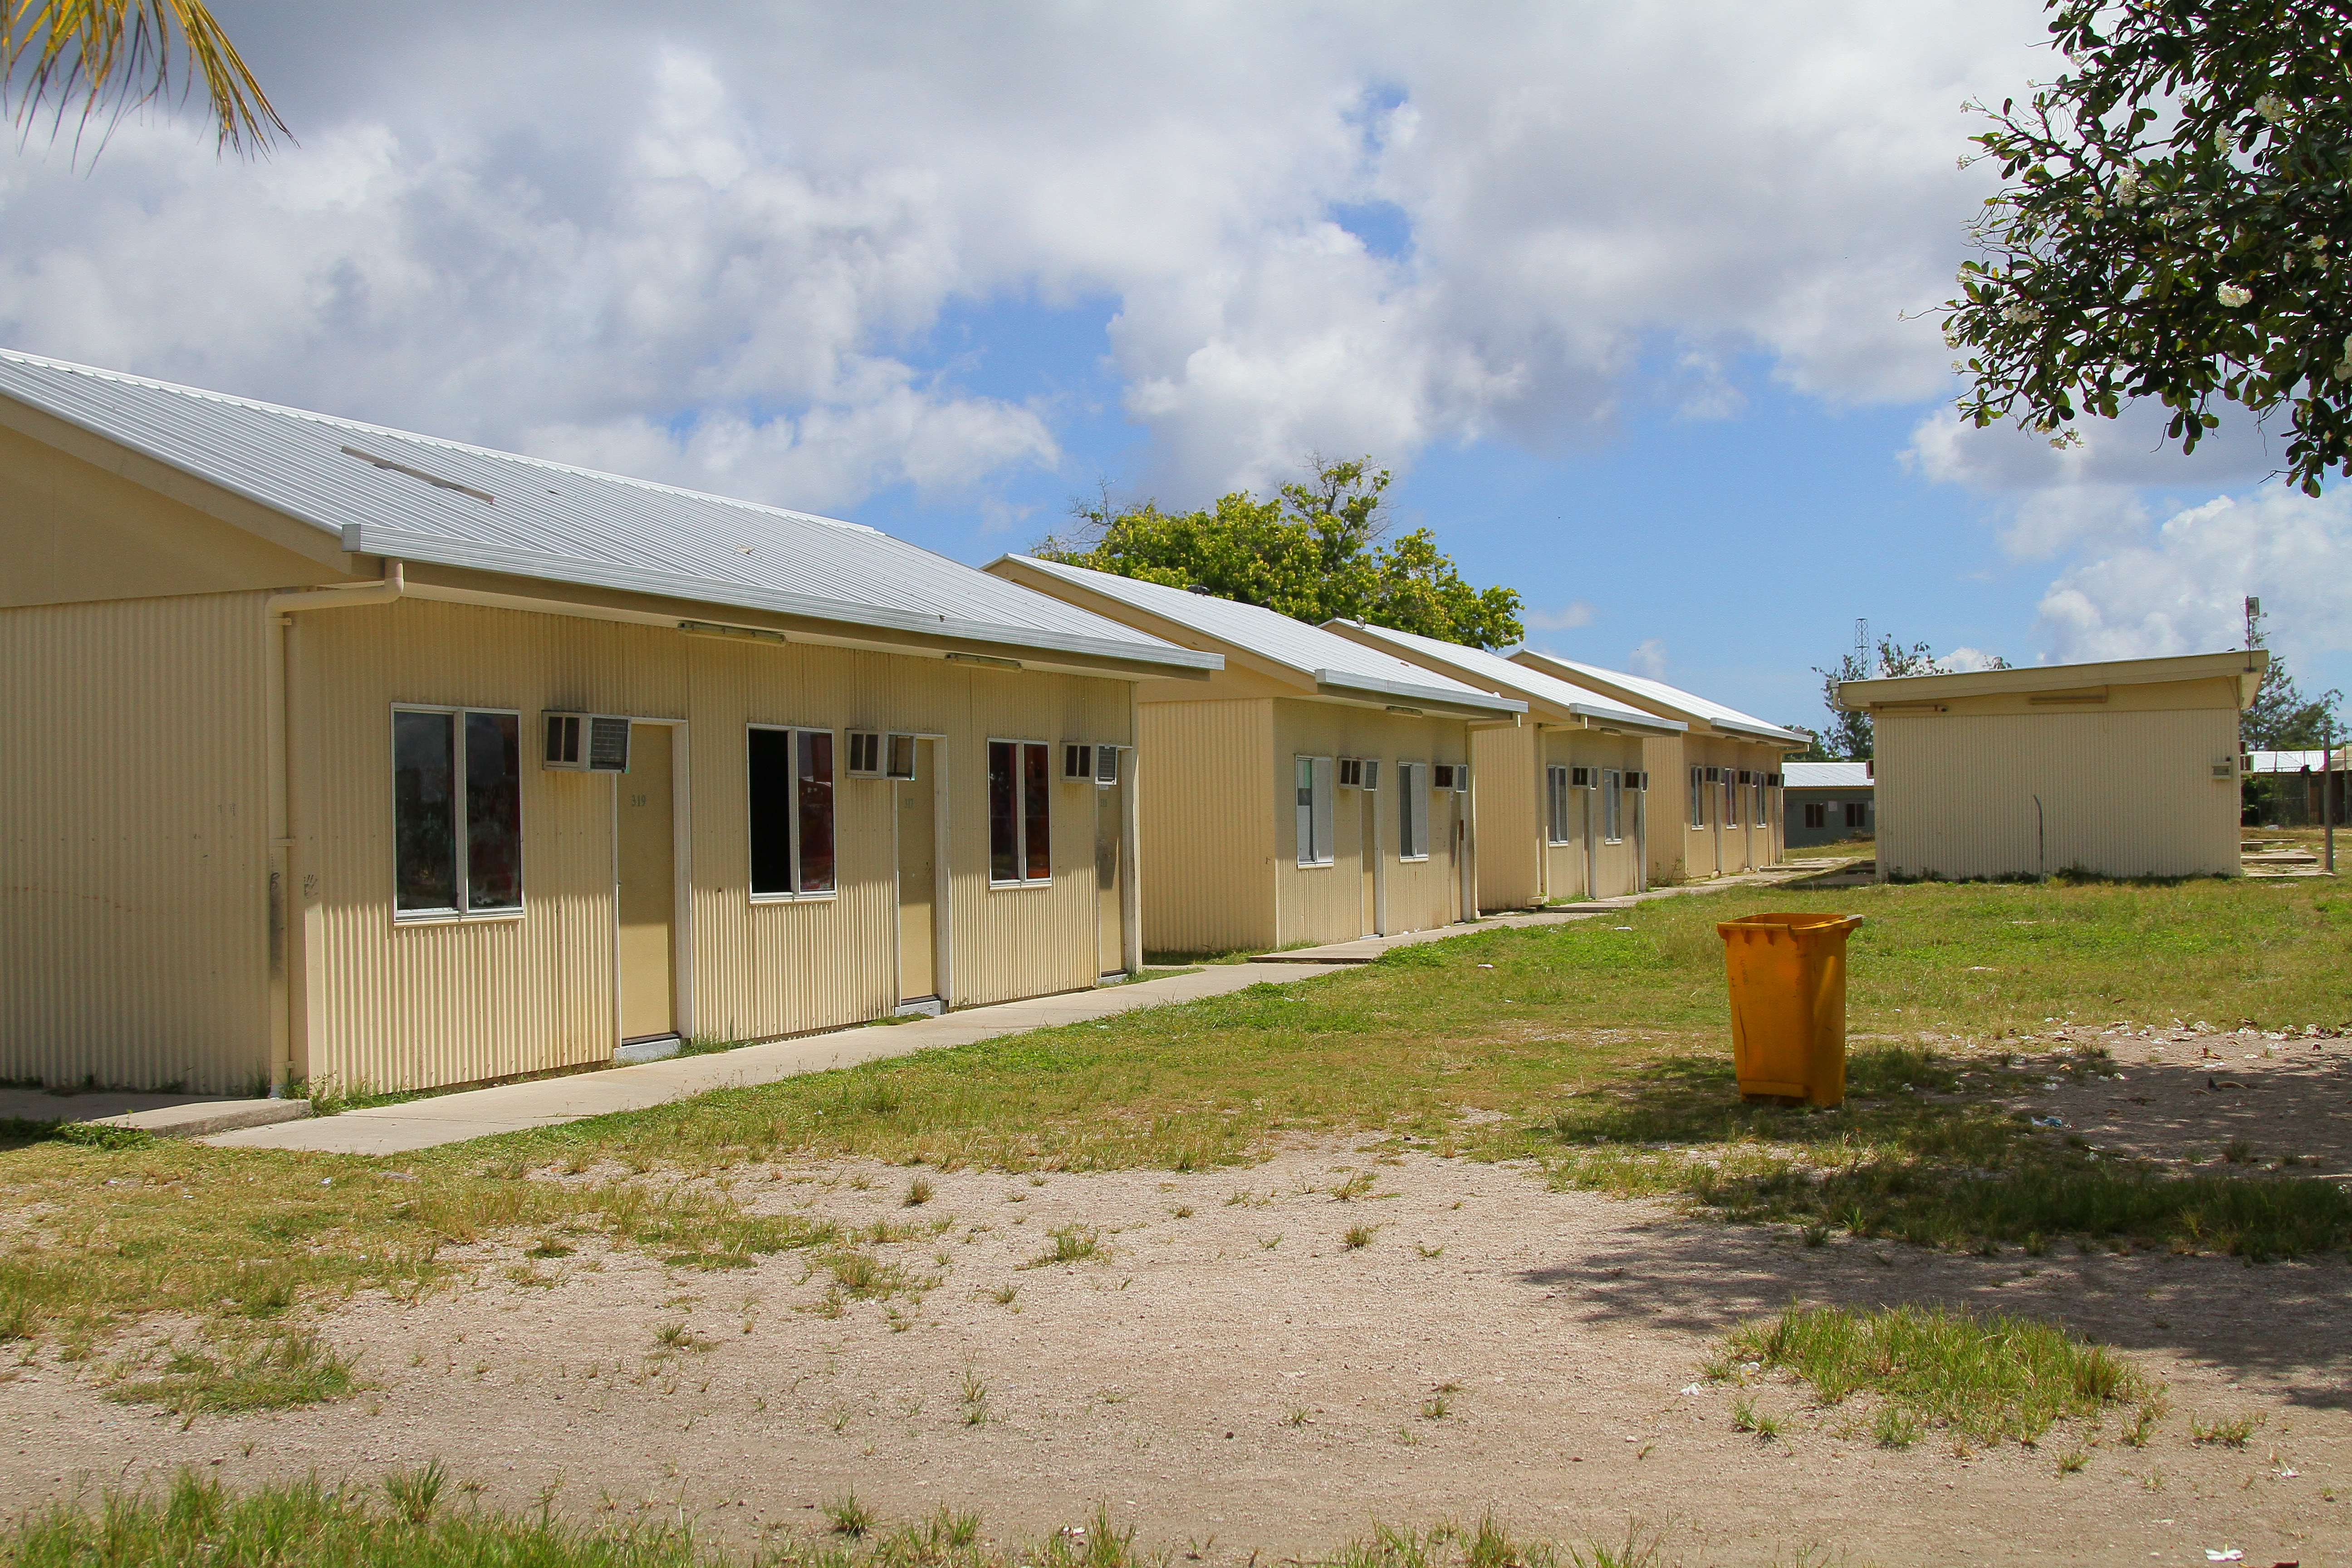 Amnesty: Australia using Nauru as 'open-air prison'